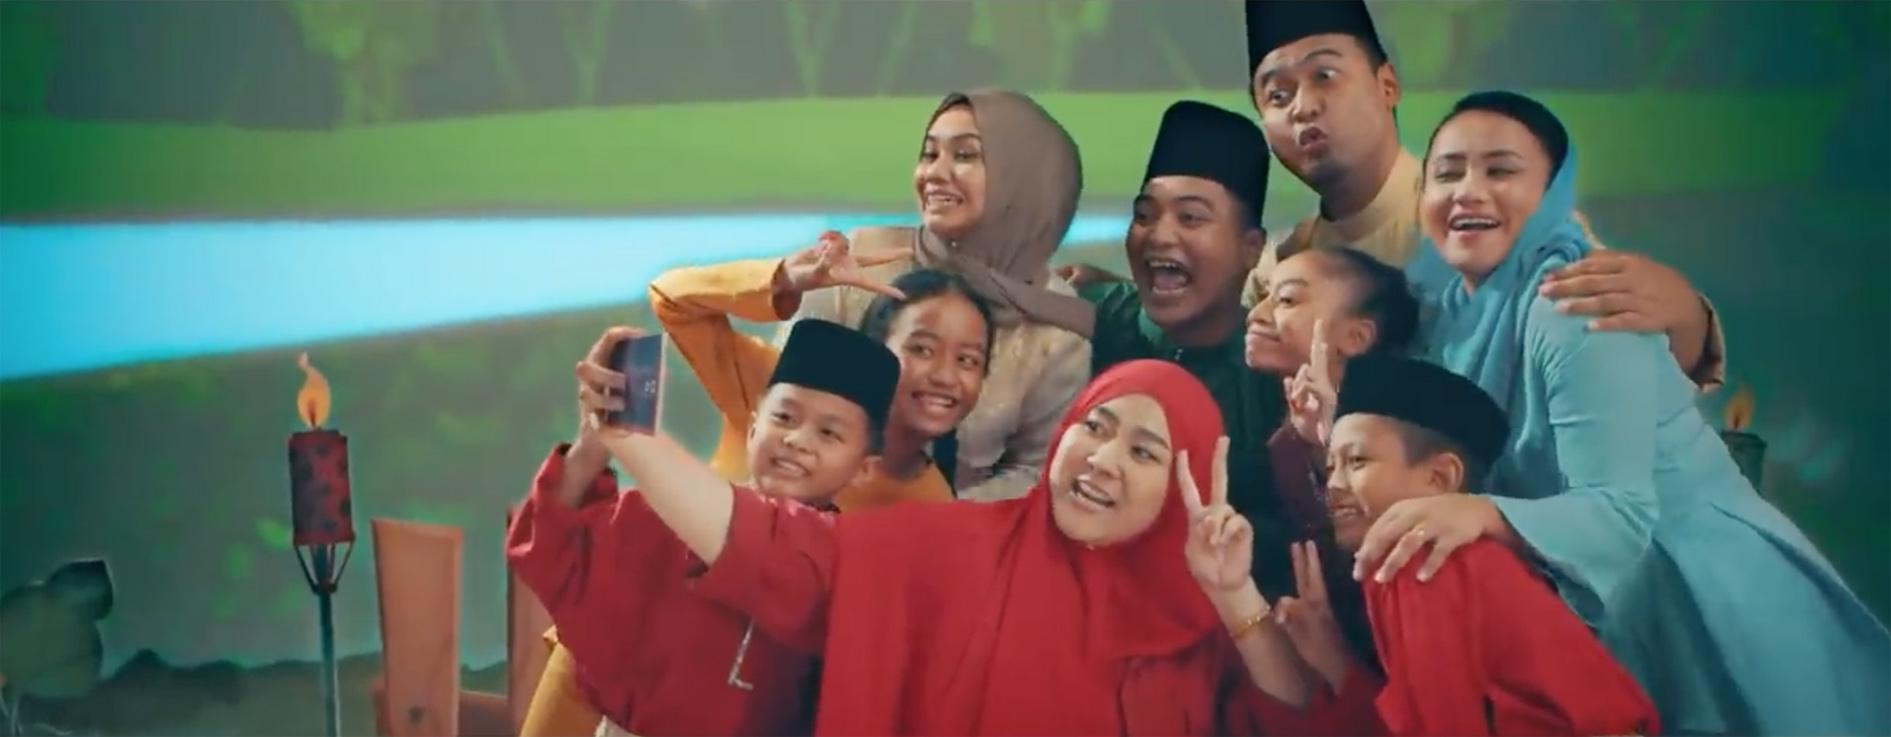 Malaysian Indie band turns KFC into musical instruments for Hari Raya, via Naga DDB Tribal